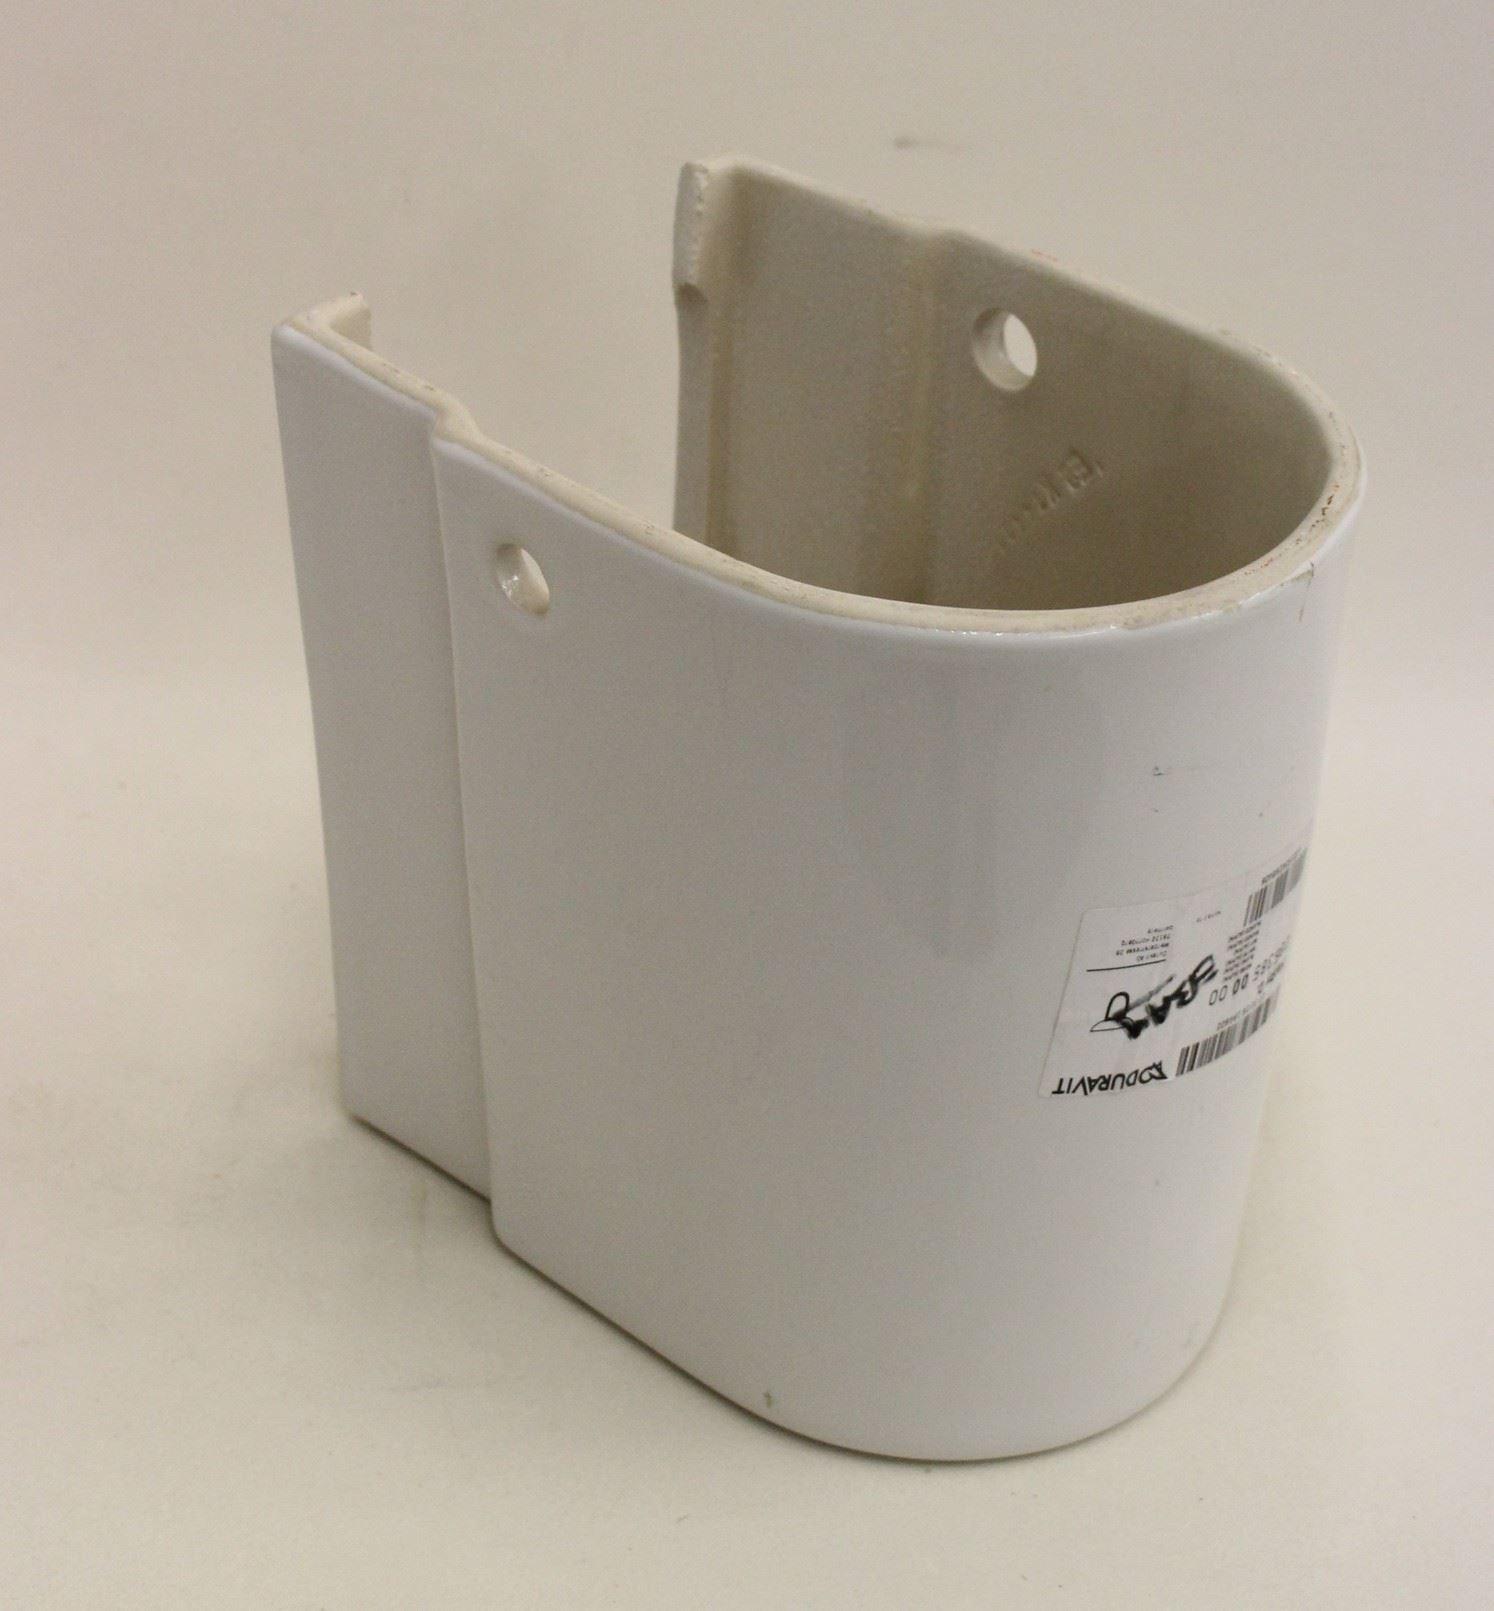 Sink Wrap For Pedestal Sink : ... -Happy-D-0863850000-Semi-Pedestal-Bathroom-Handwash-Sink-Basin-Cover